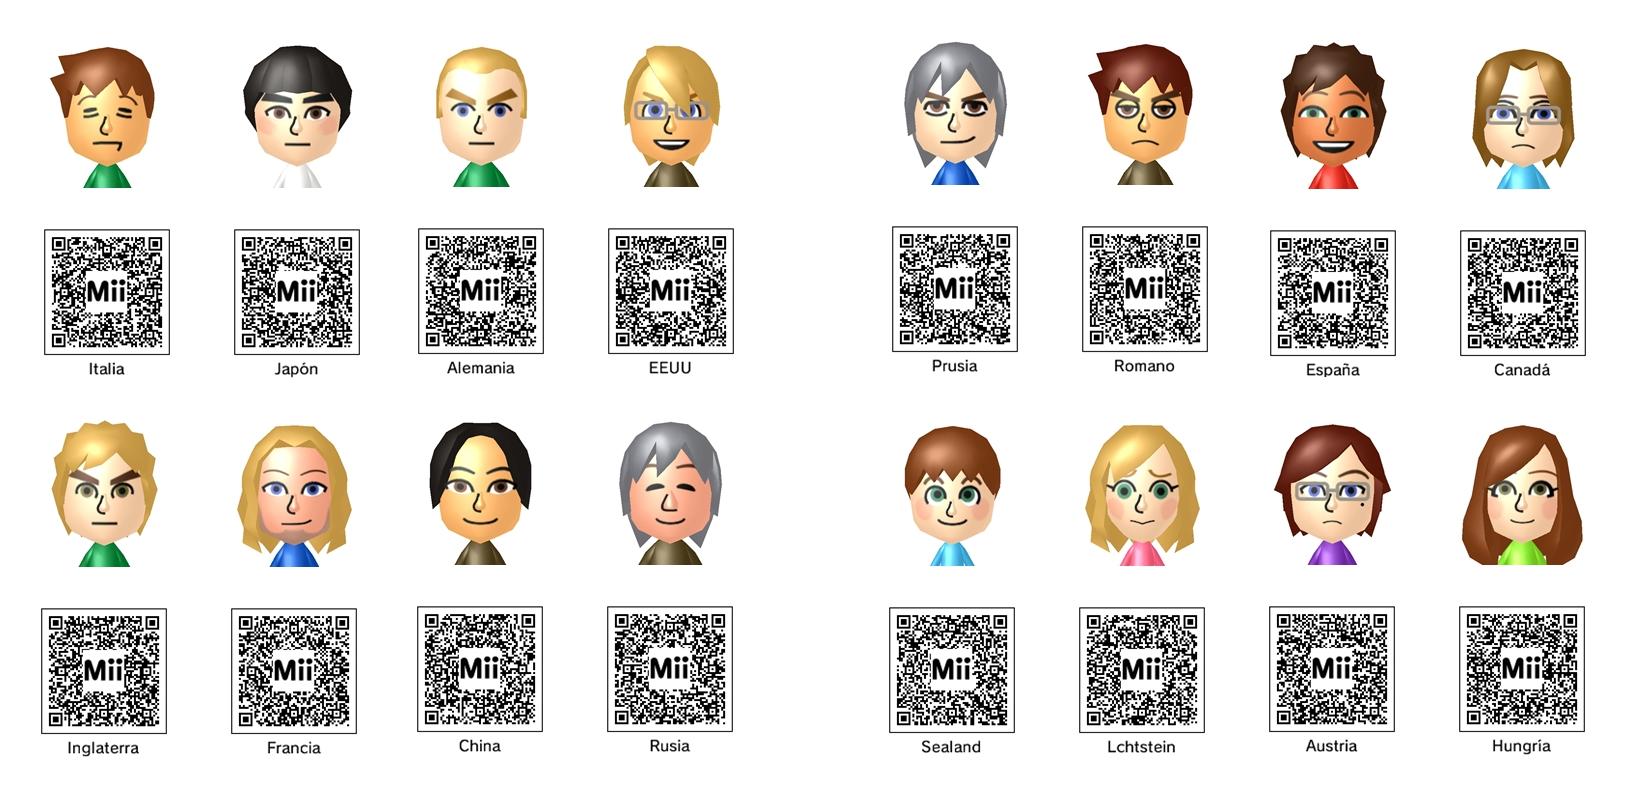 Anime Mii Characters 3ds : Hetalia miis n ds by mikkandois on deviantart